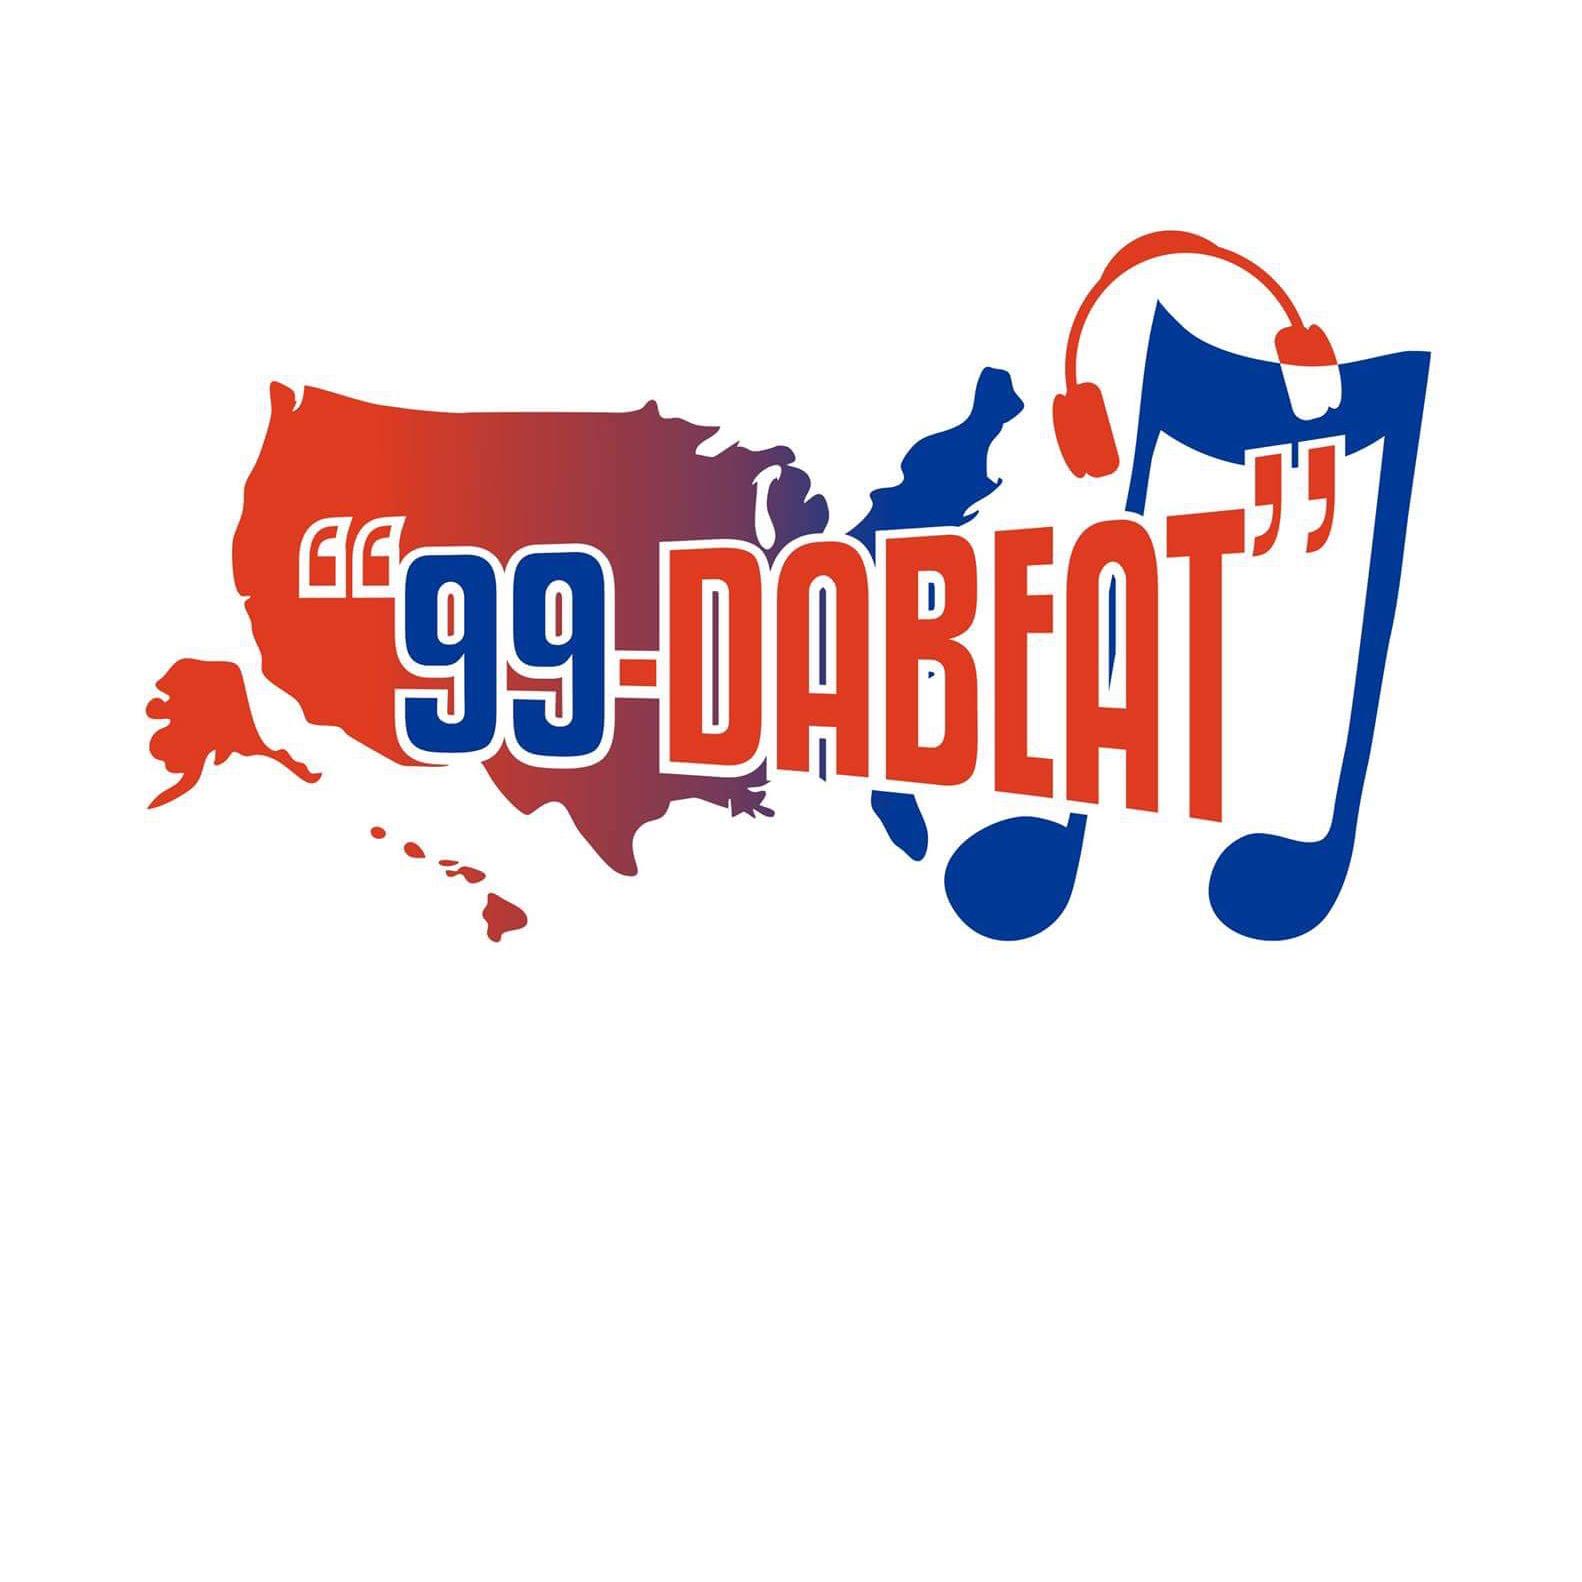 99-DaBeat